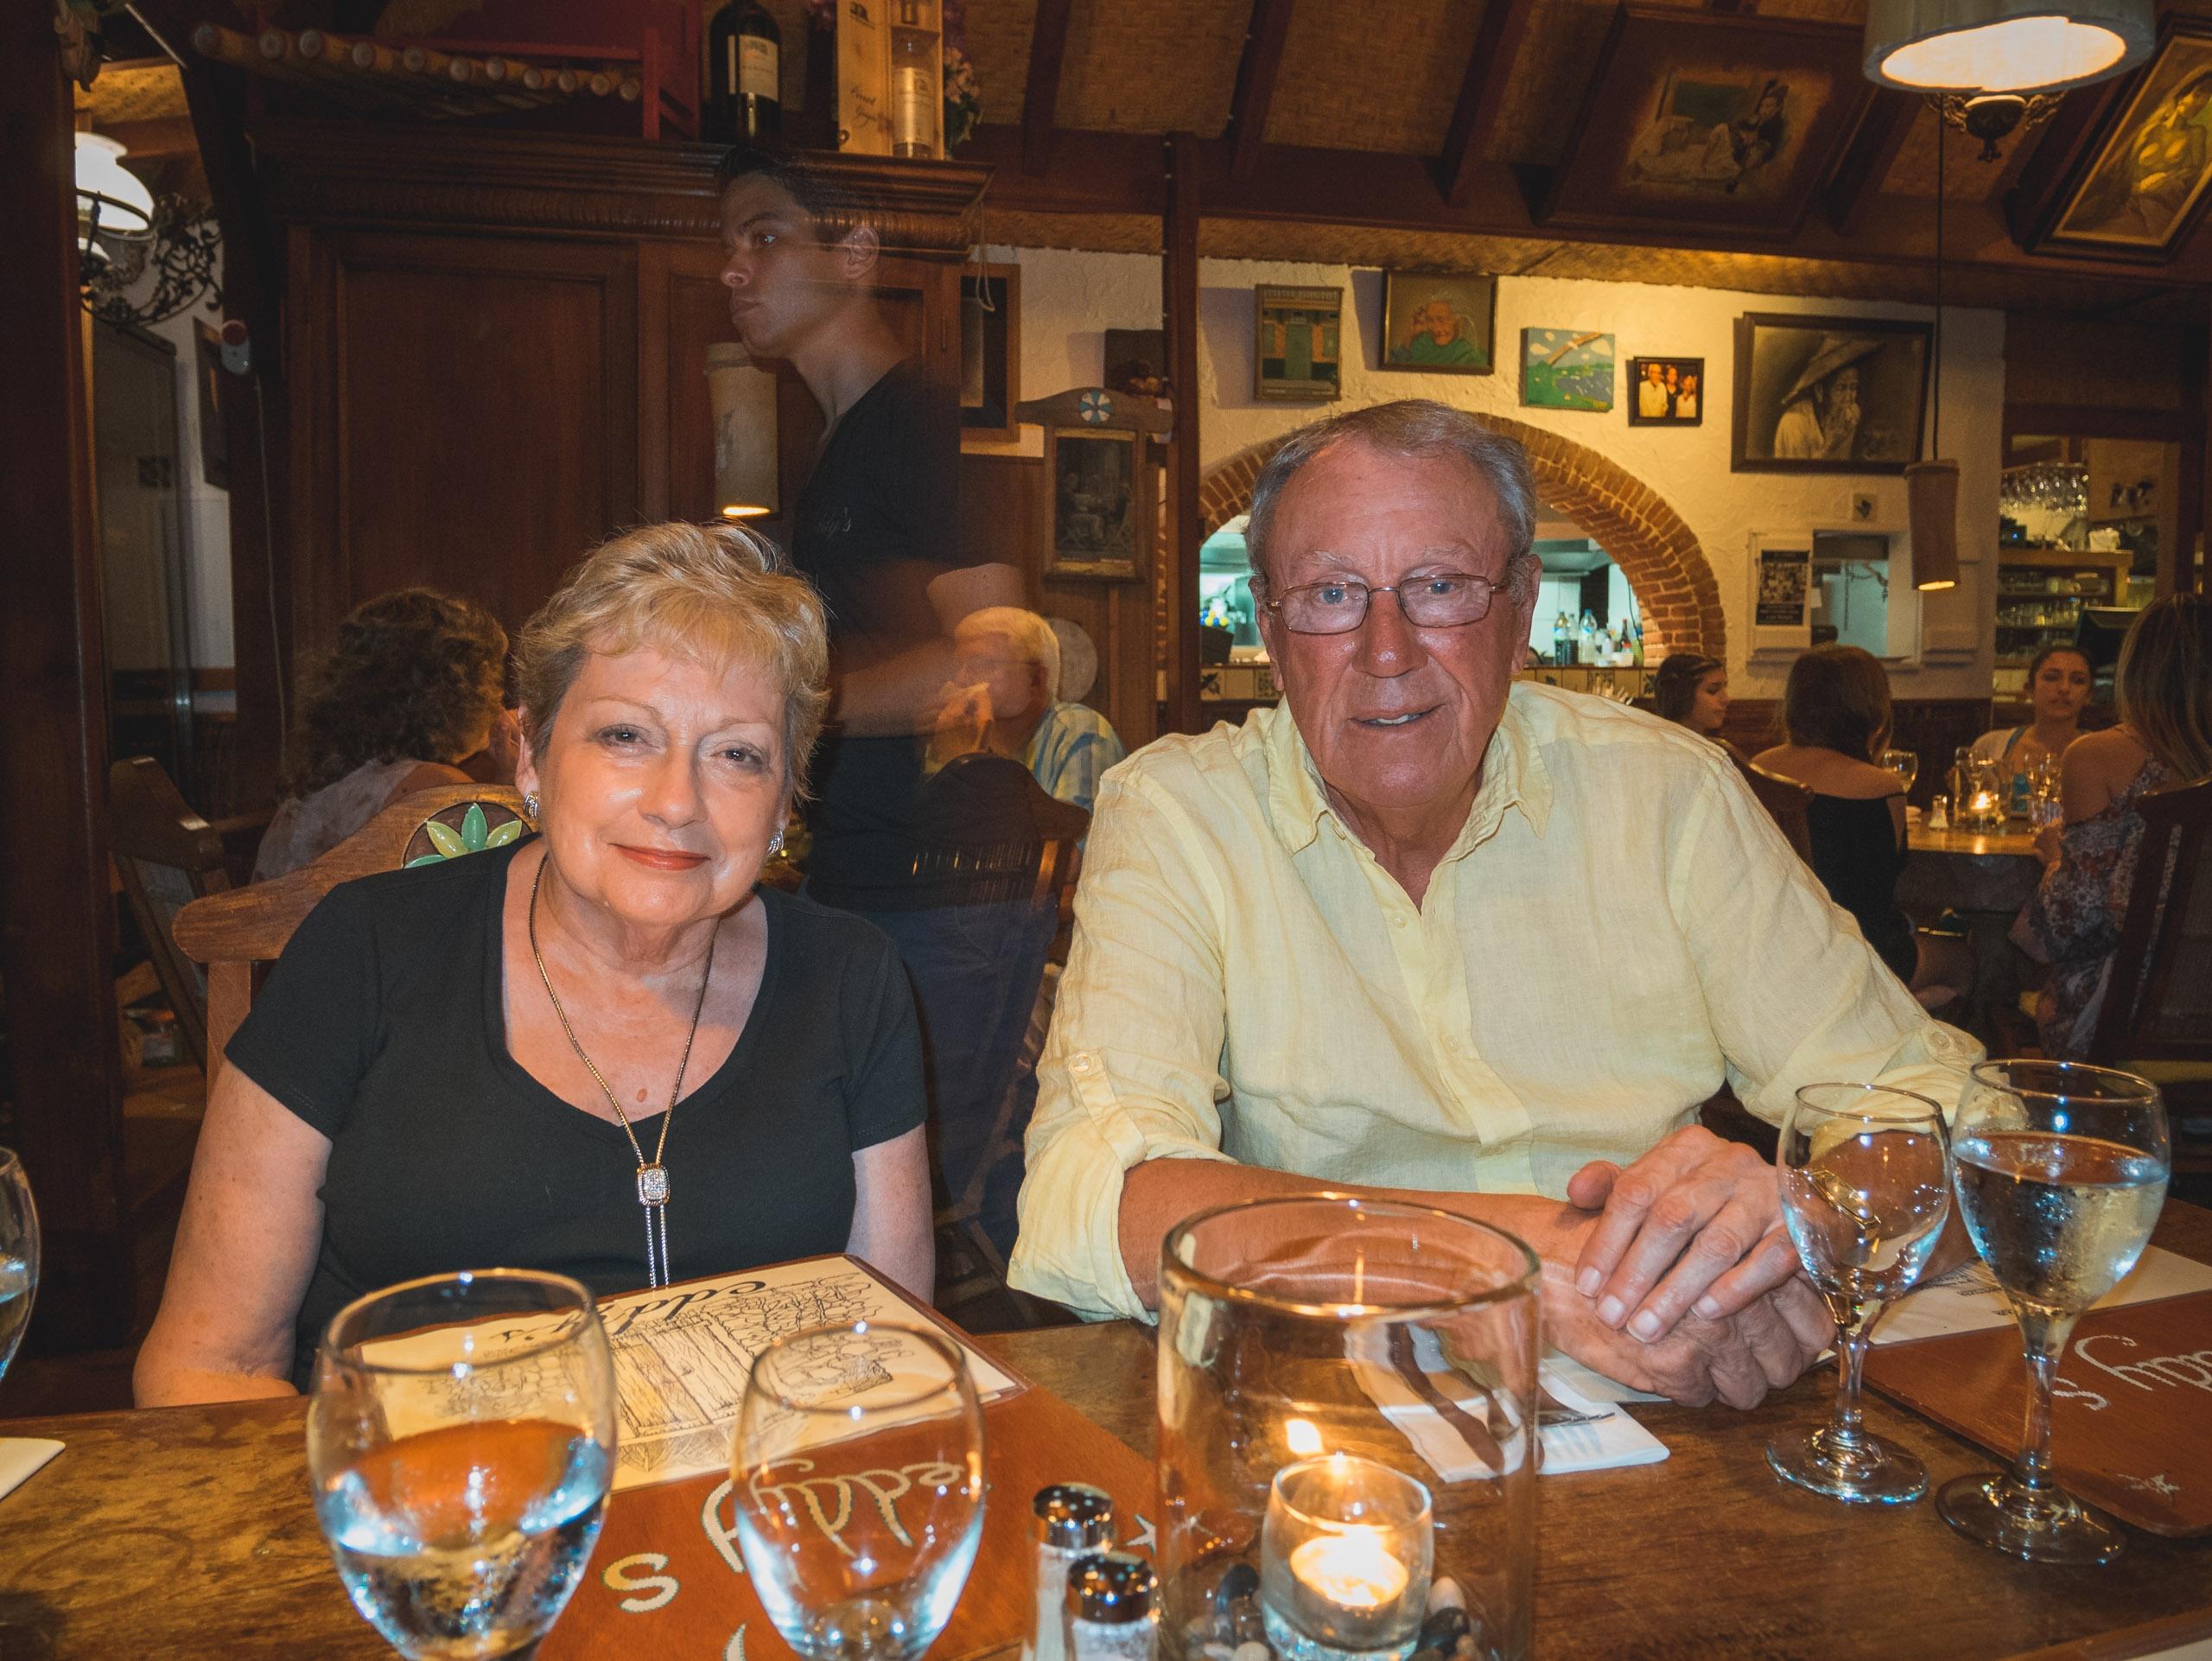 Lynn and Warren Dinner at Eddys